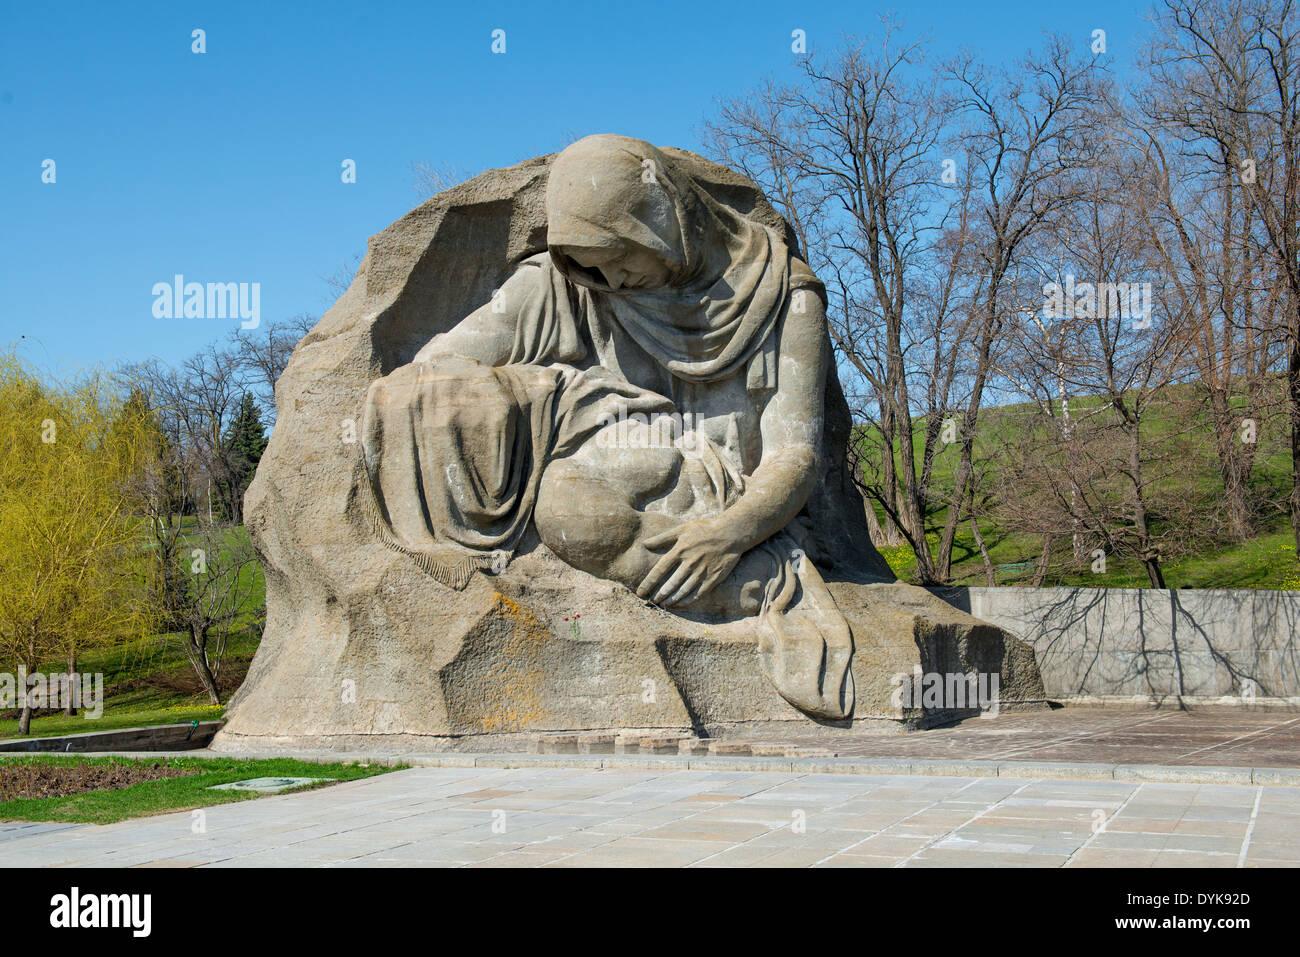 The monument of Grieving Mother in Mamayev Kurgan memorial complex in Volgograd (former Stalingrad), Russia. - Stock Image